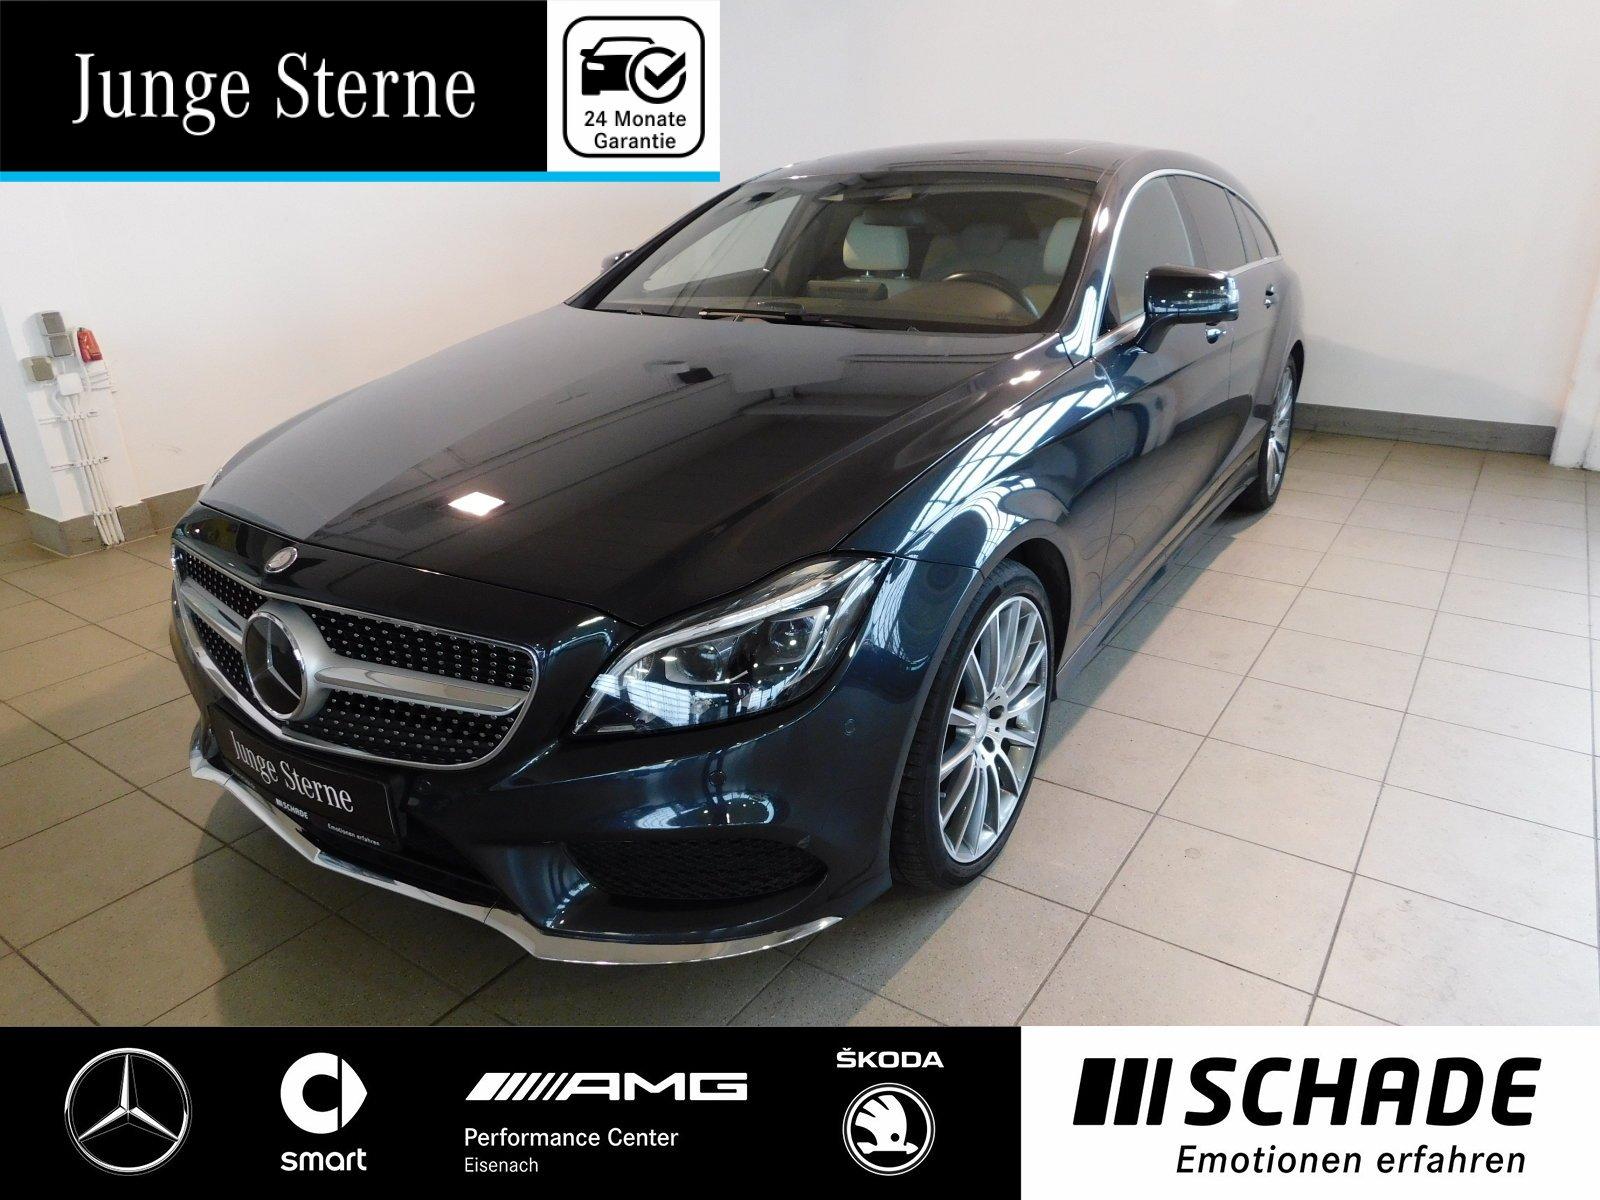 Mercedes-Benz CLS 400 SB AMG Line Comand*LED Multib.*Airmatic*, Jahr 2015, petrol